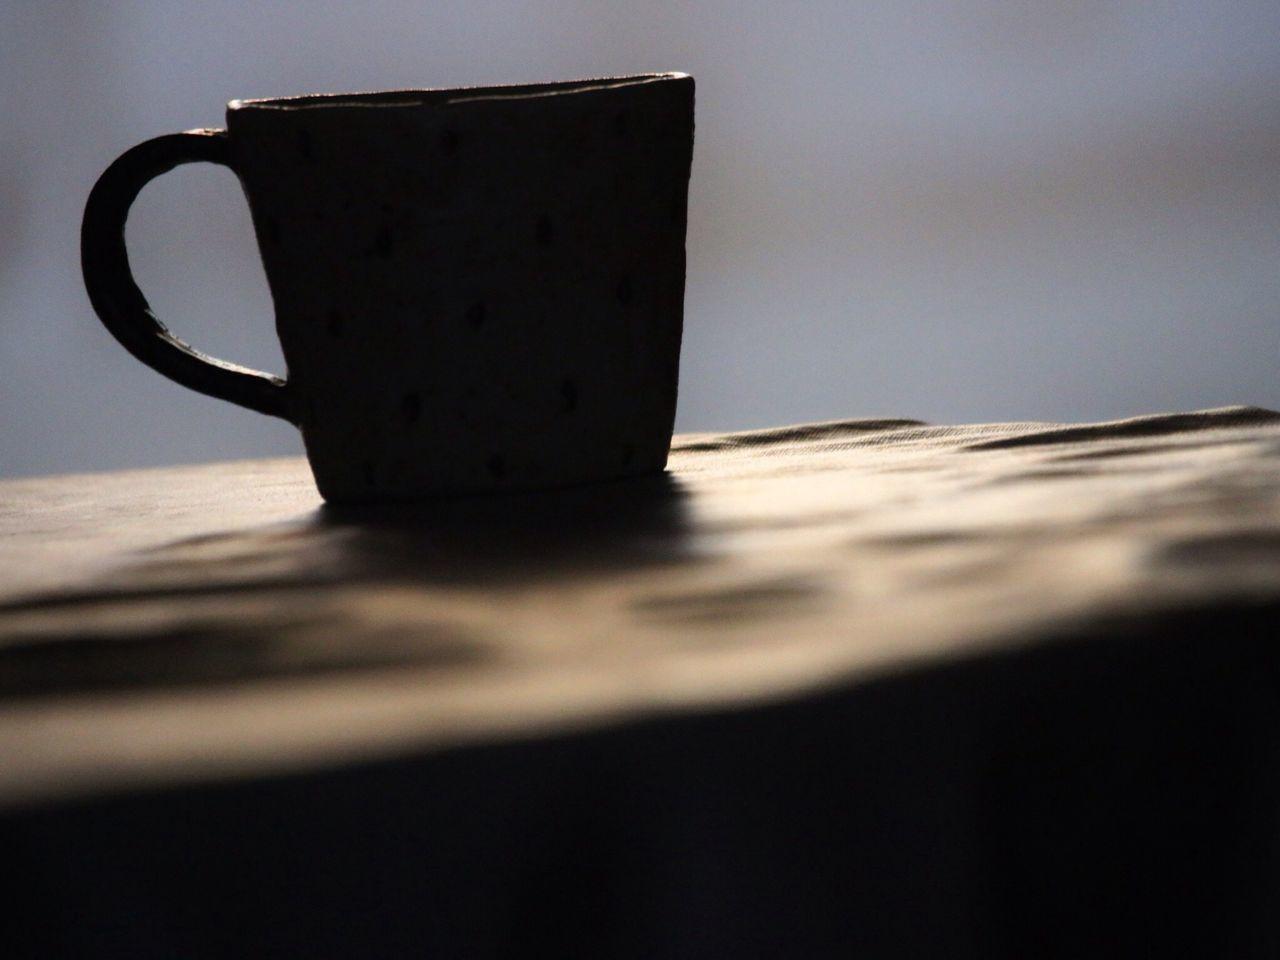 Beautiful stock photos of cup, Coffee Cup, Domestic Life, Indoors, Mug